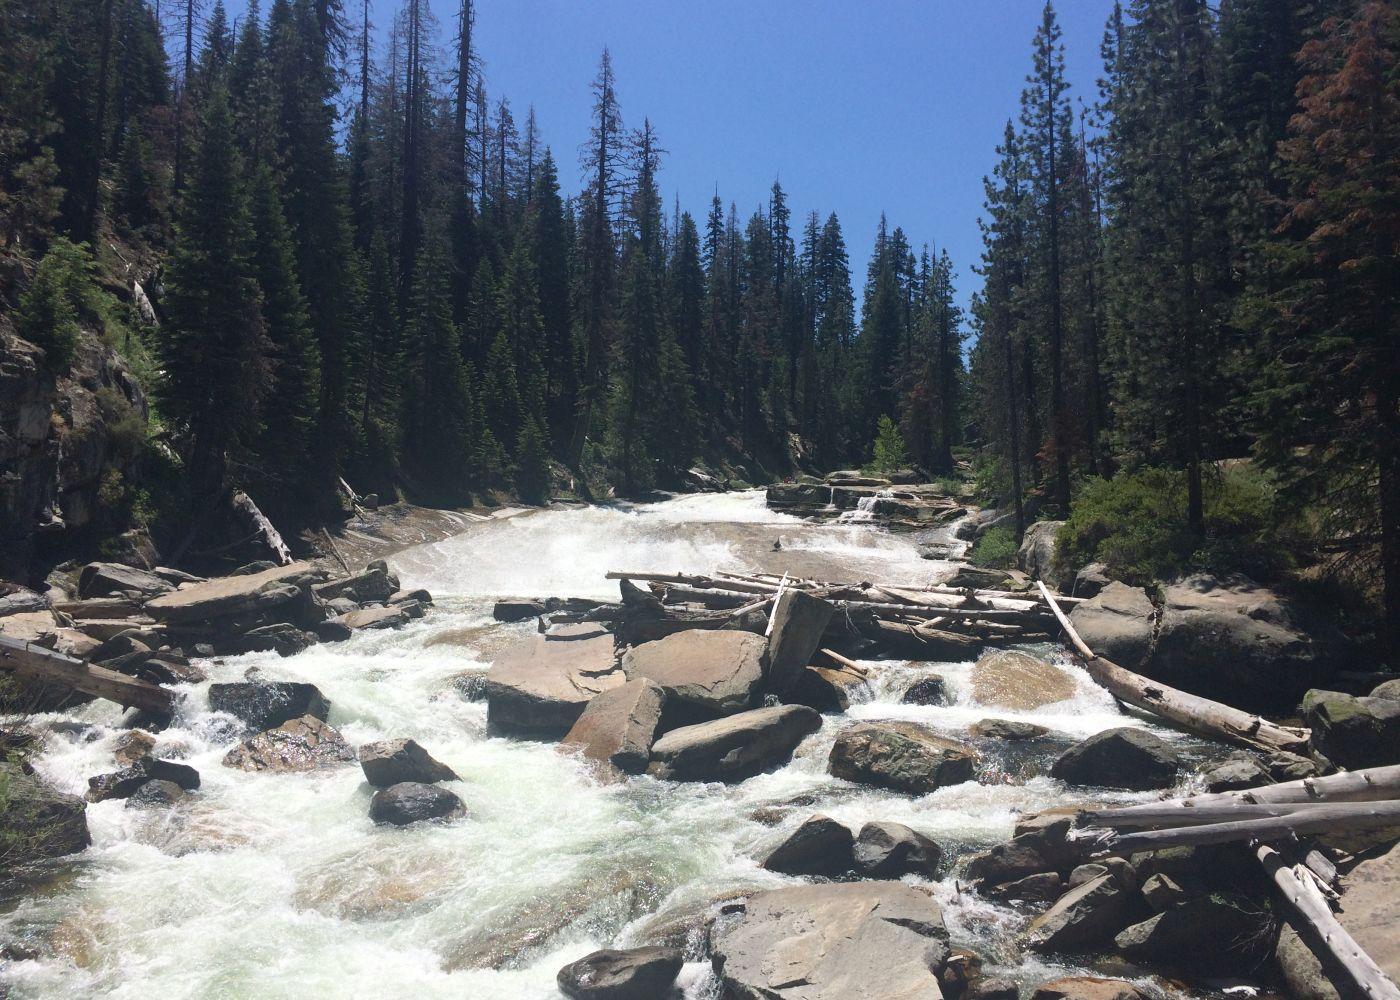 Southern Yosemite Wilderness Medley California